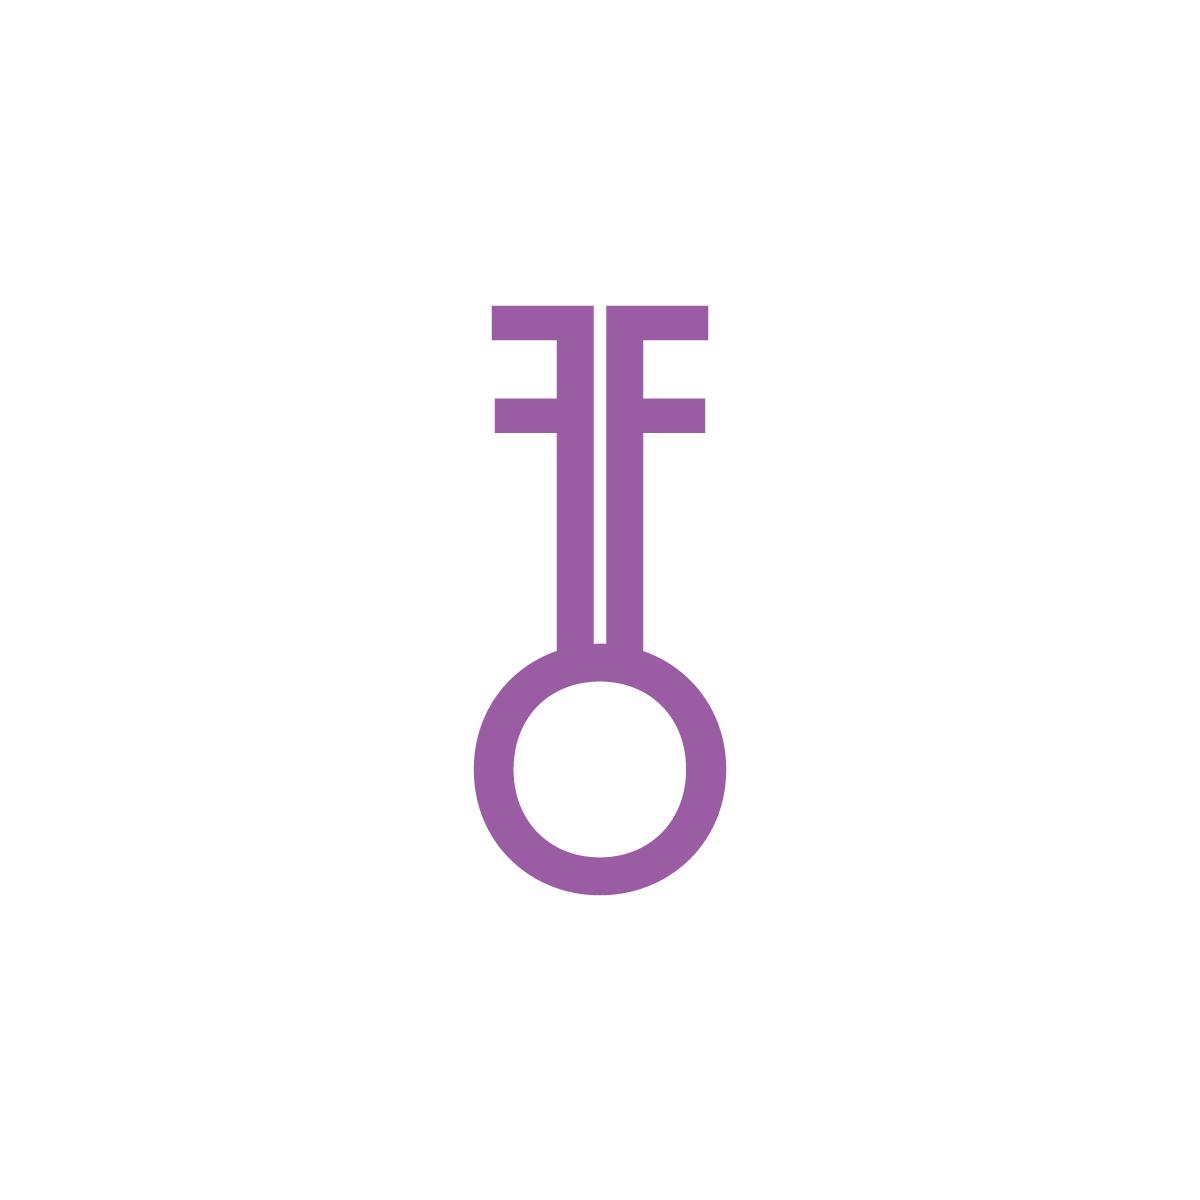 #Logo #Branding #italian @italy #brand #brandidentity #Corporate   #belowtheline #type #graphic